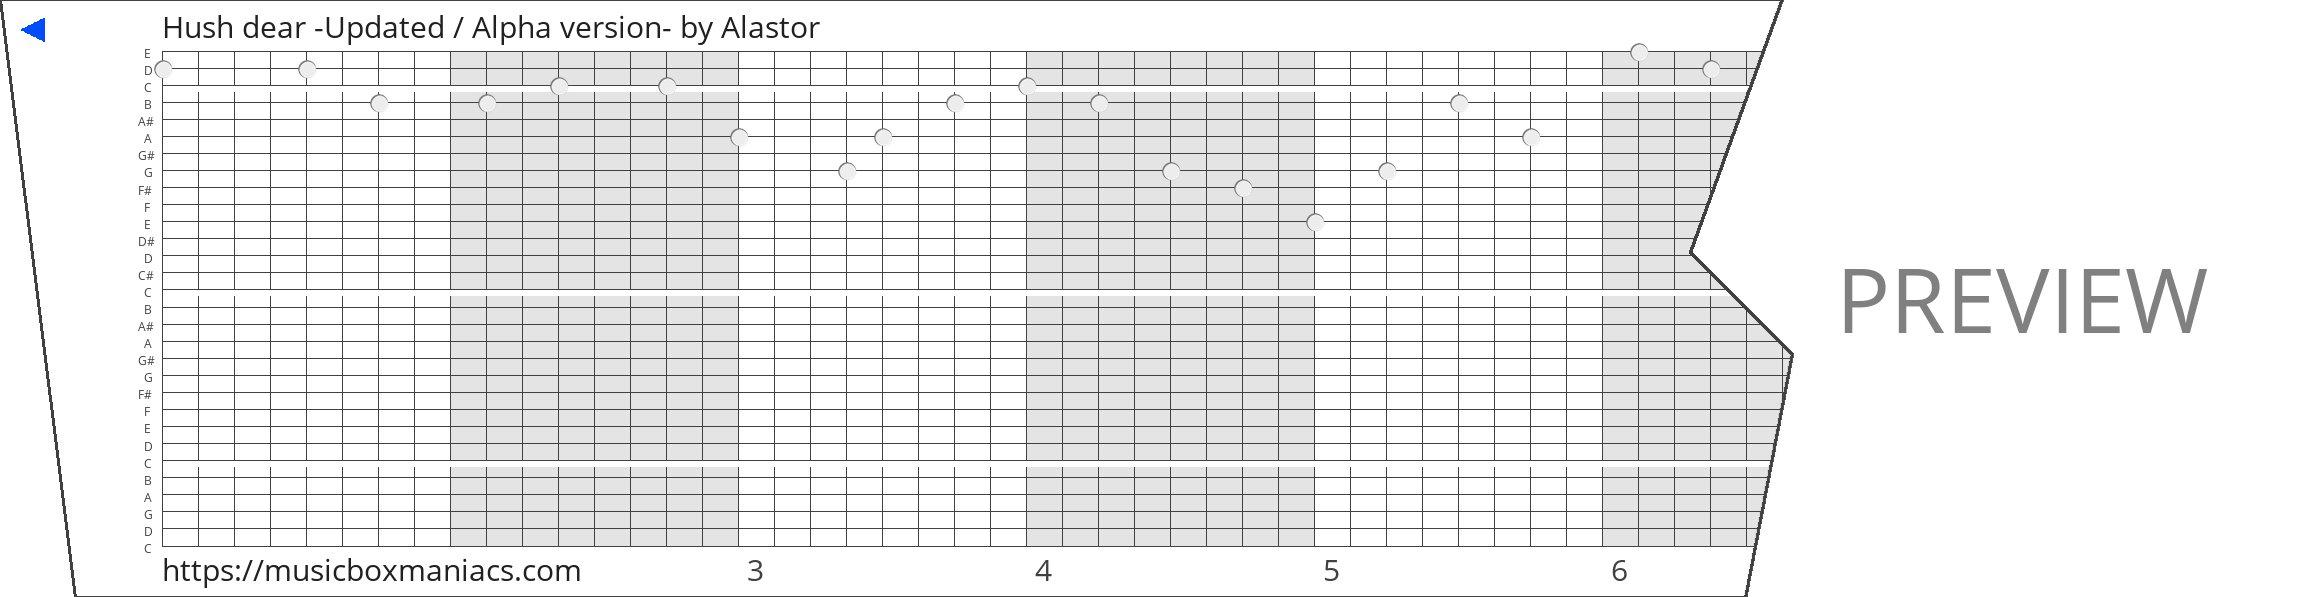 Hush dear -Updated / Alpha version- 30 note music box paper strip